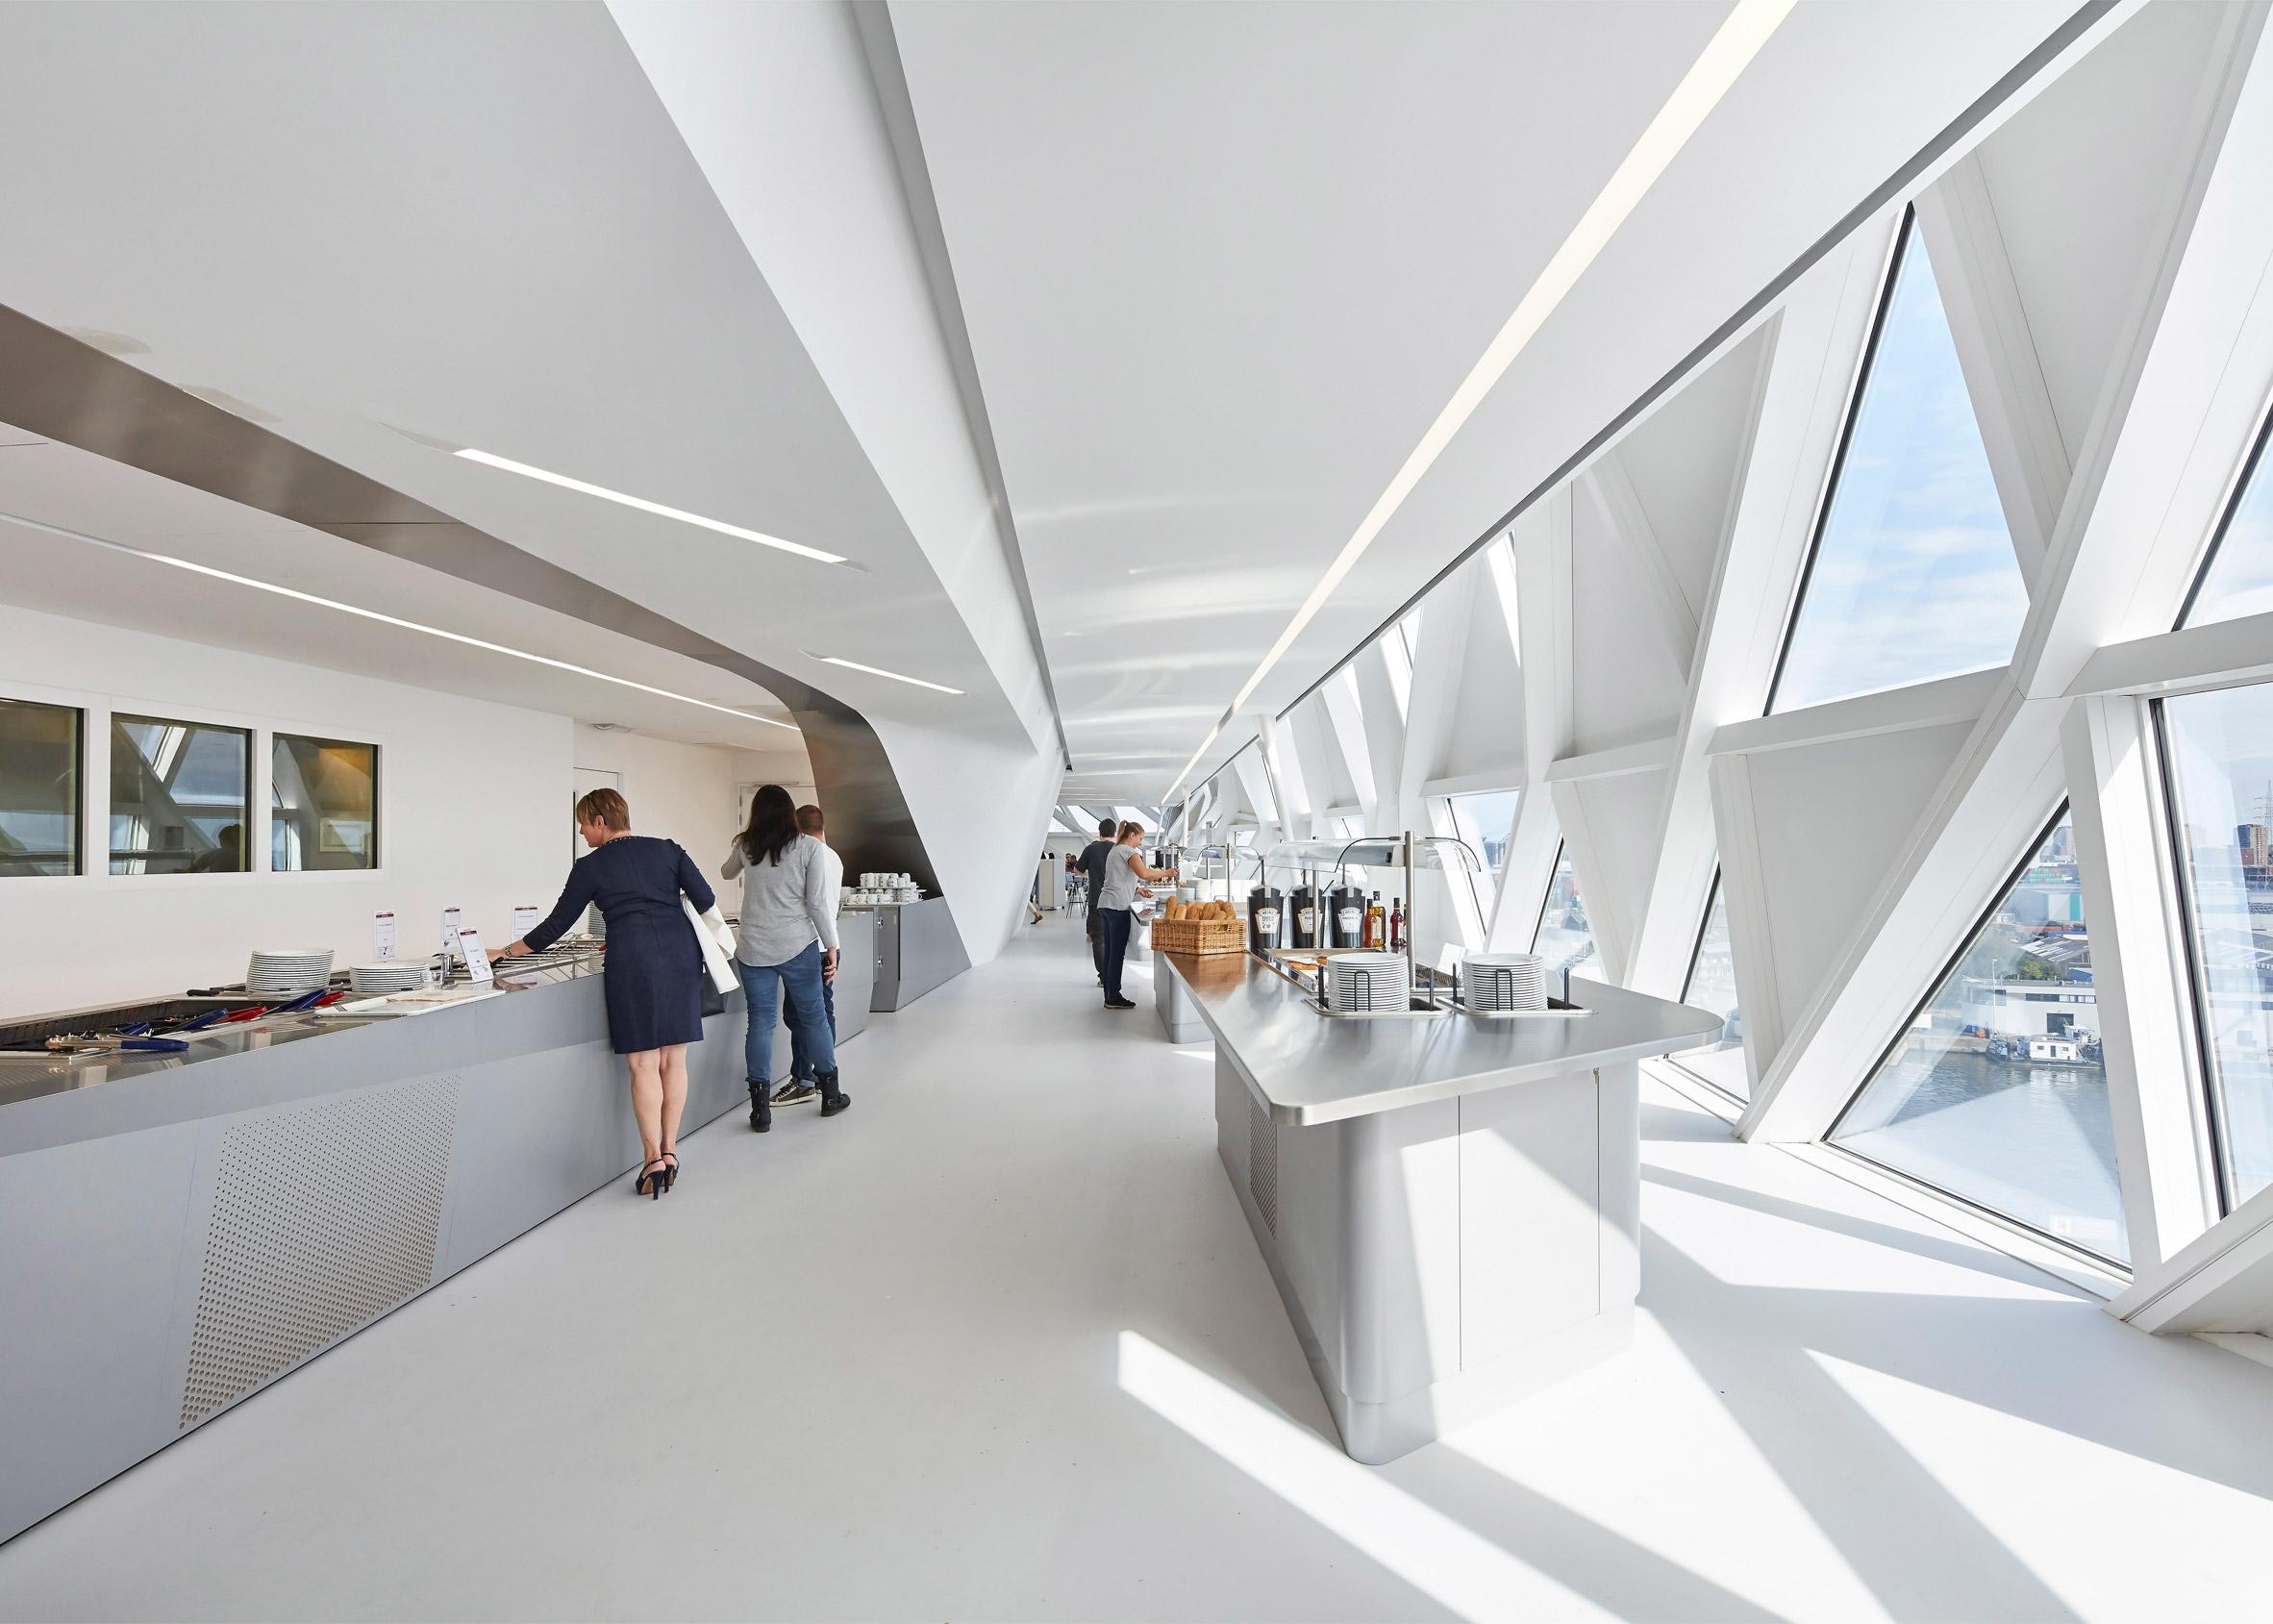 port-house-antwerp-zaha-hadid-architects-hufton-and-crow_dezeen_2364_ss_8